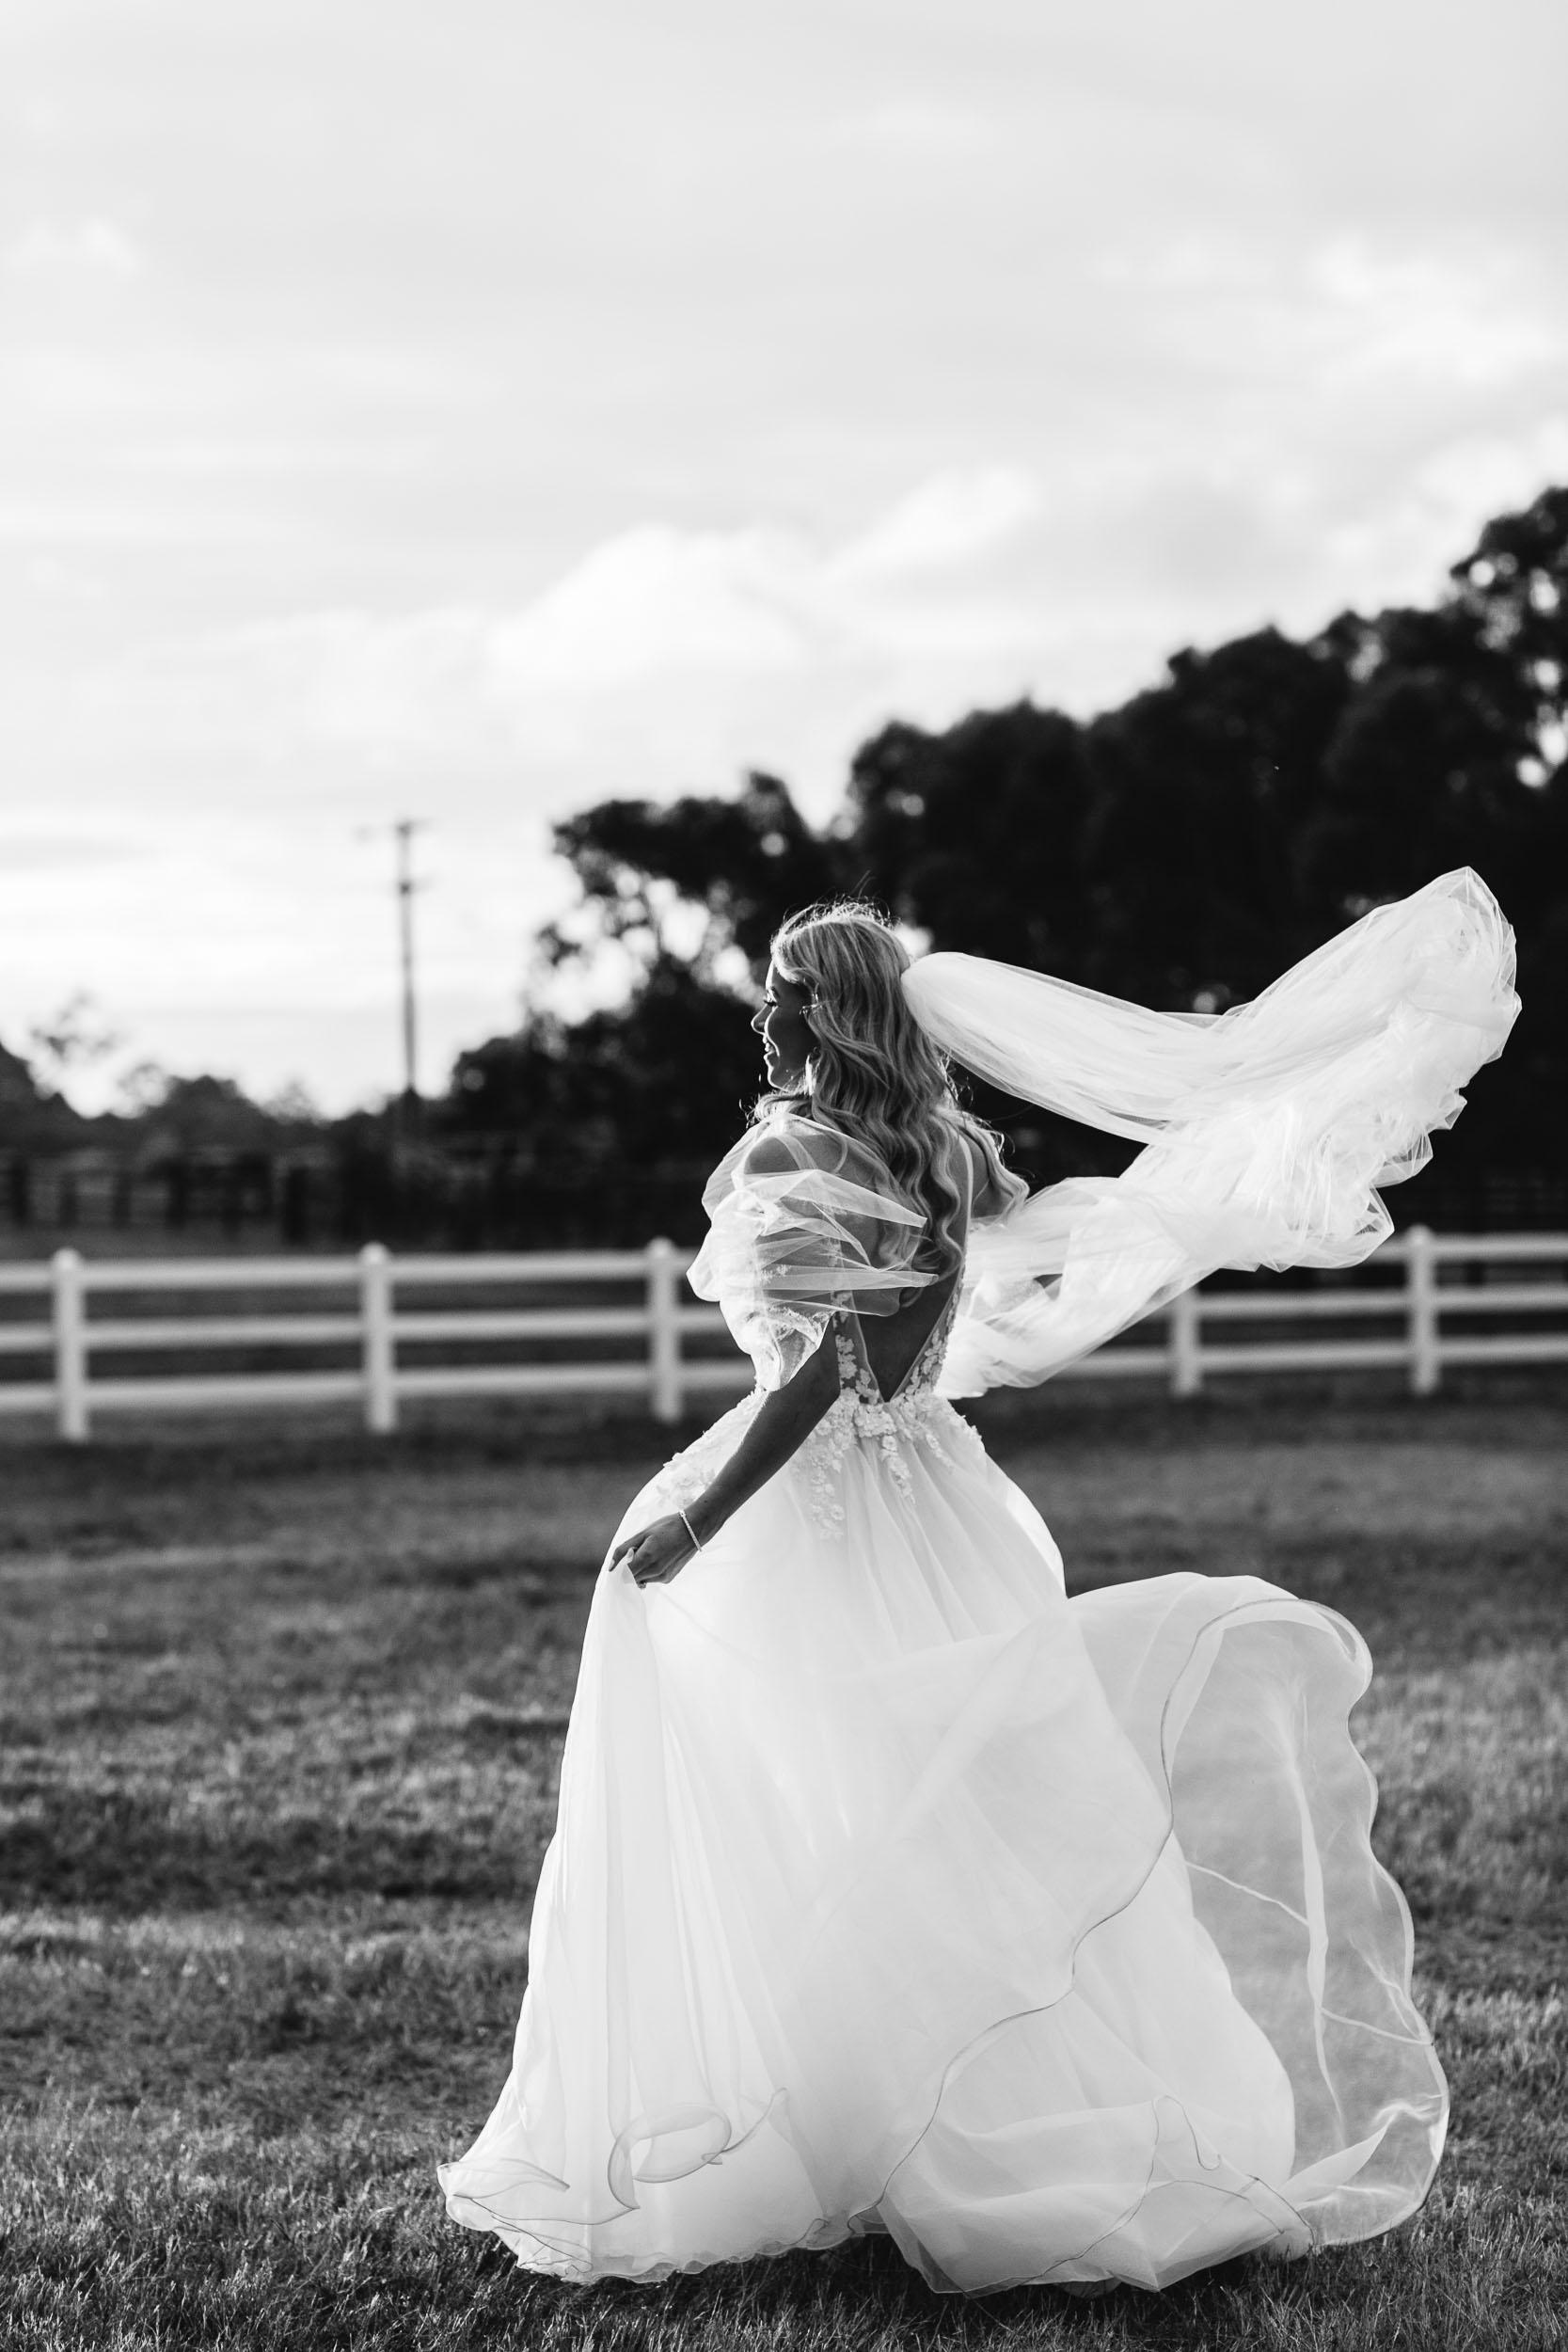 Kas-Richards-Mornington-Peninsula-Private-Property-Wedding-Marianna-Hardwick-Gown-693.jpg